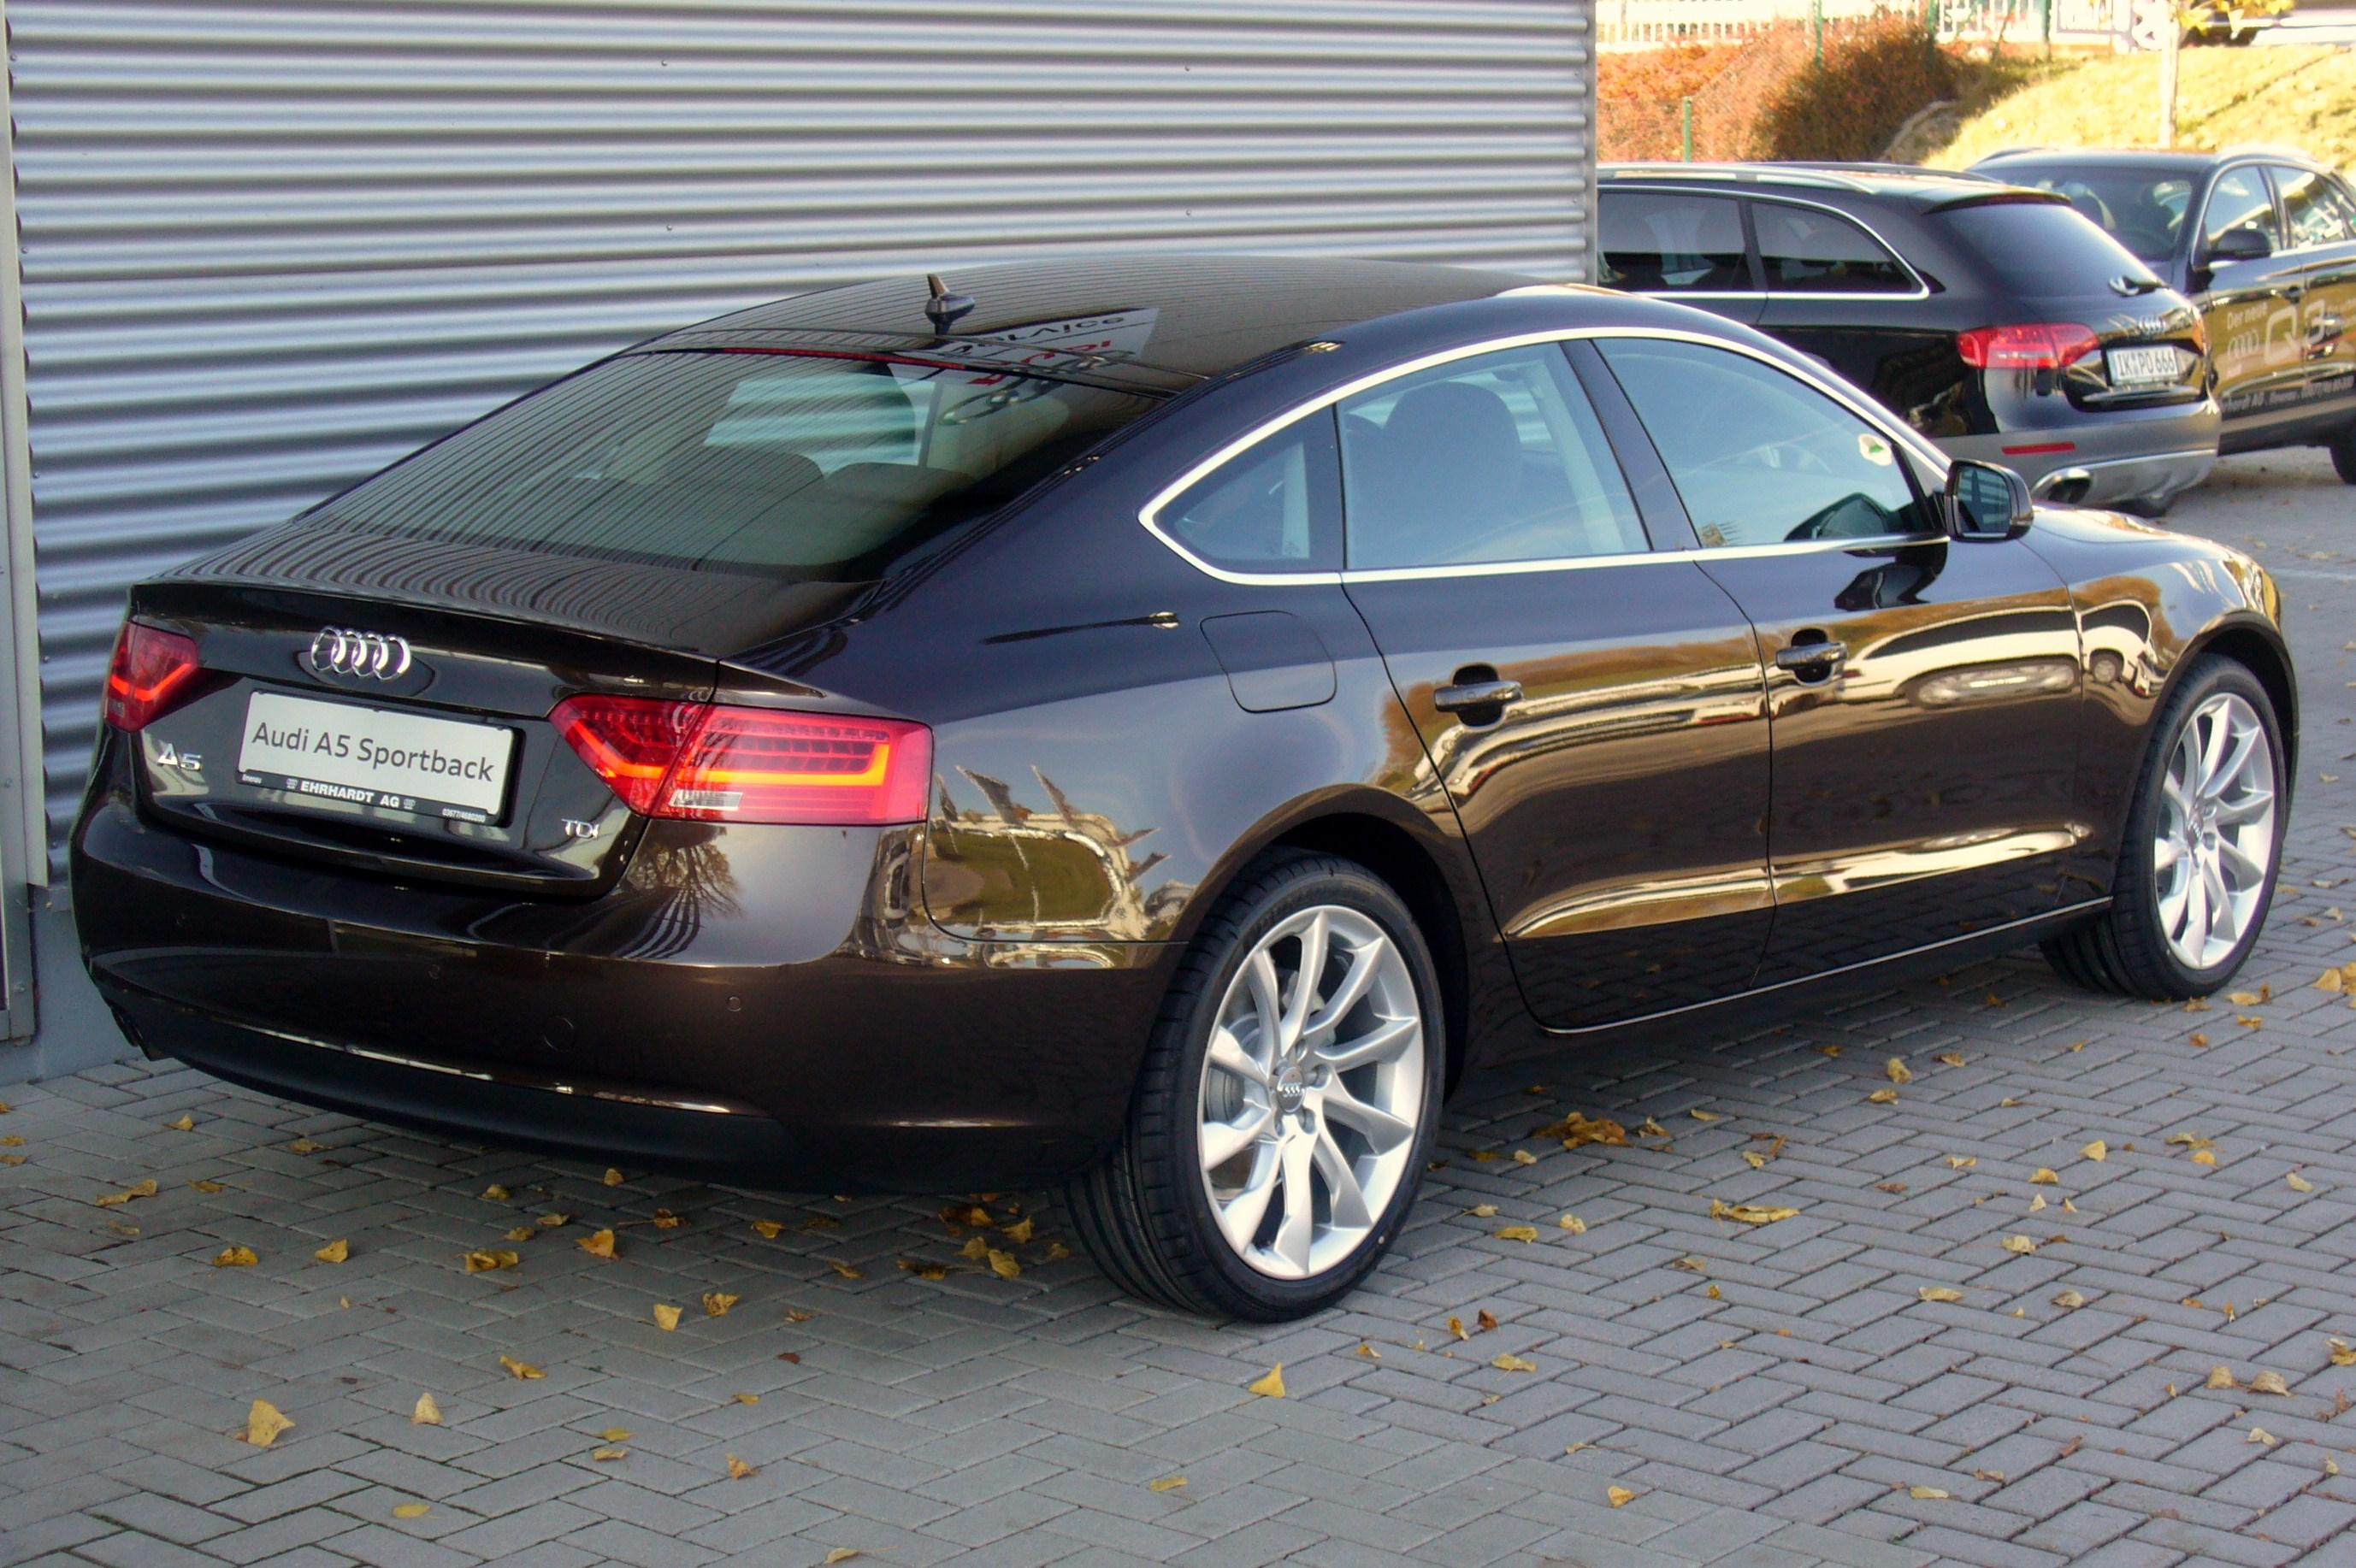 Kelebihan Audi A5 2.0 Tdi Murah Berkualitas